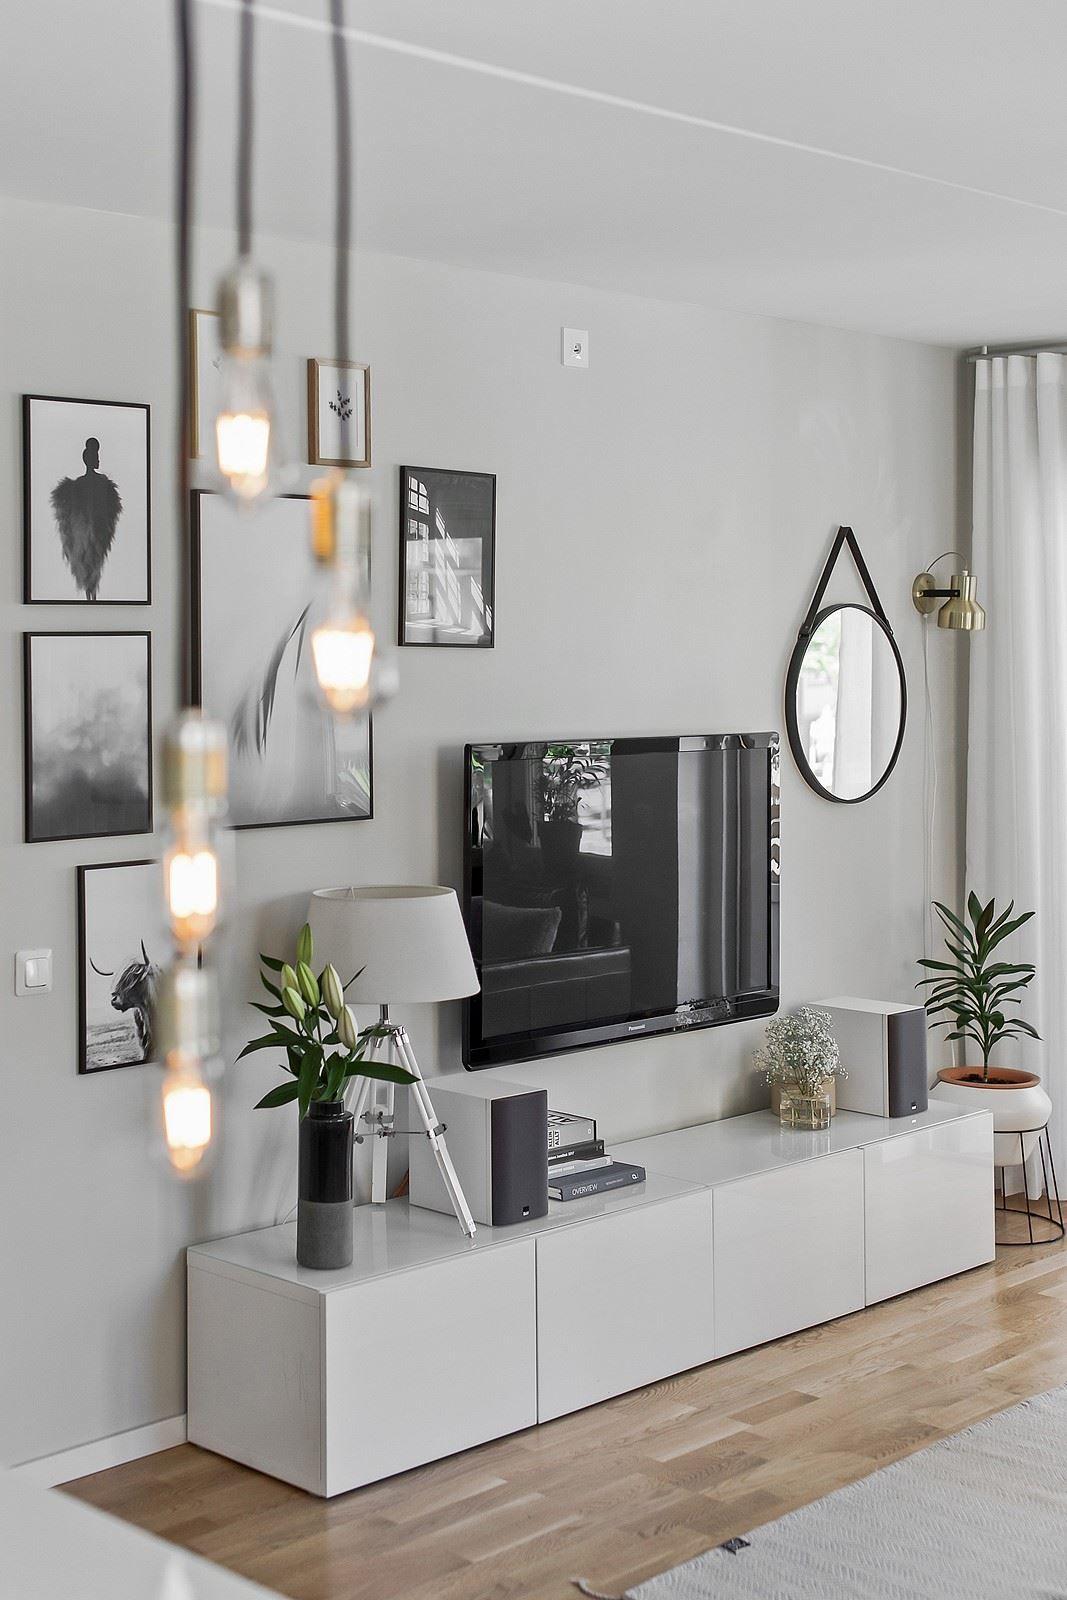 Ikea 'Best' sideboard | DECORATION D'INTERIEUR ...